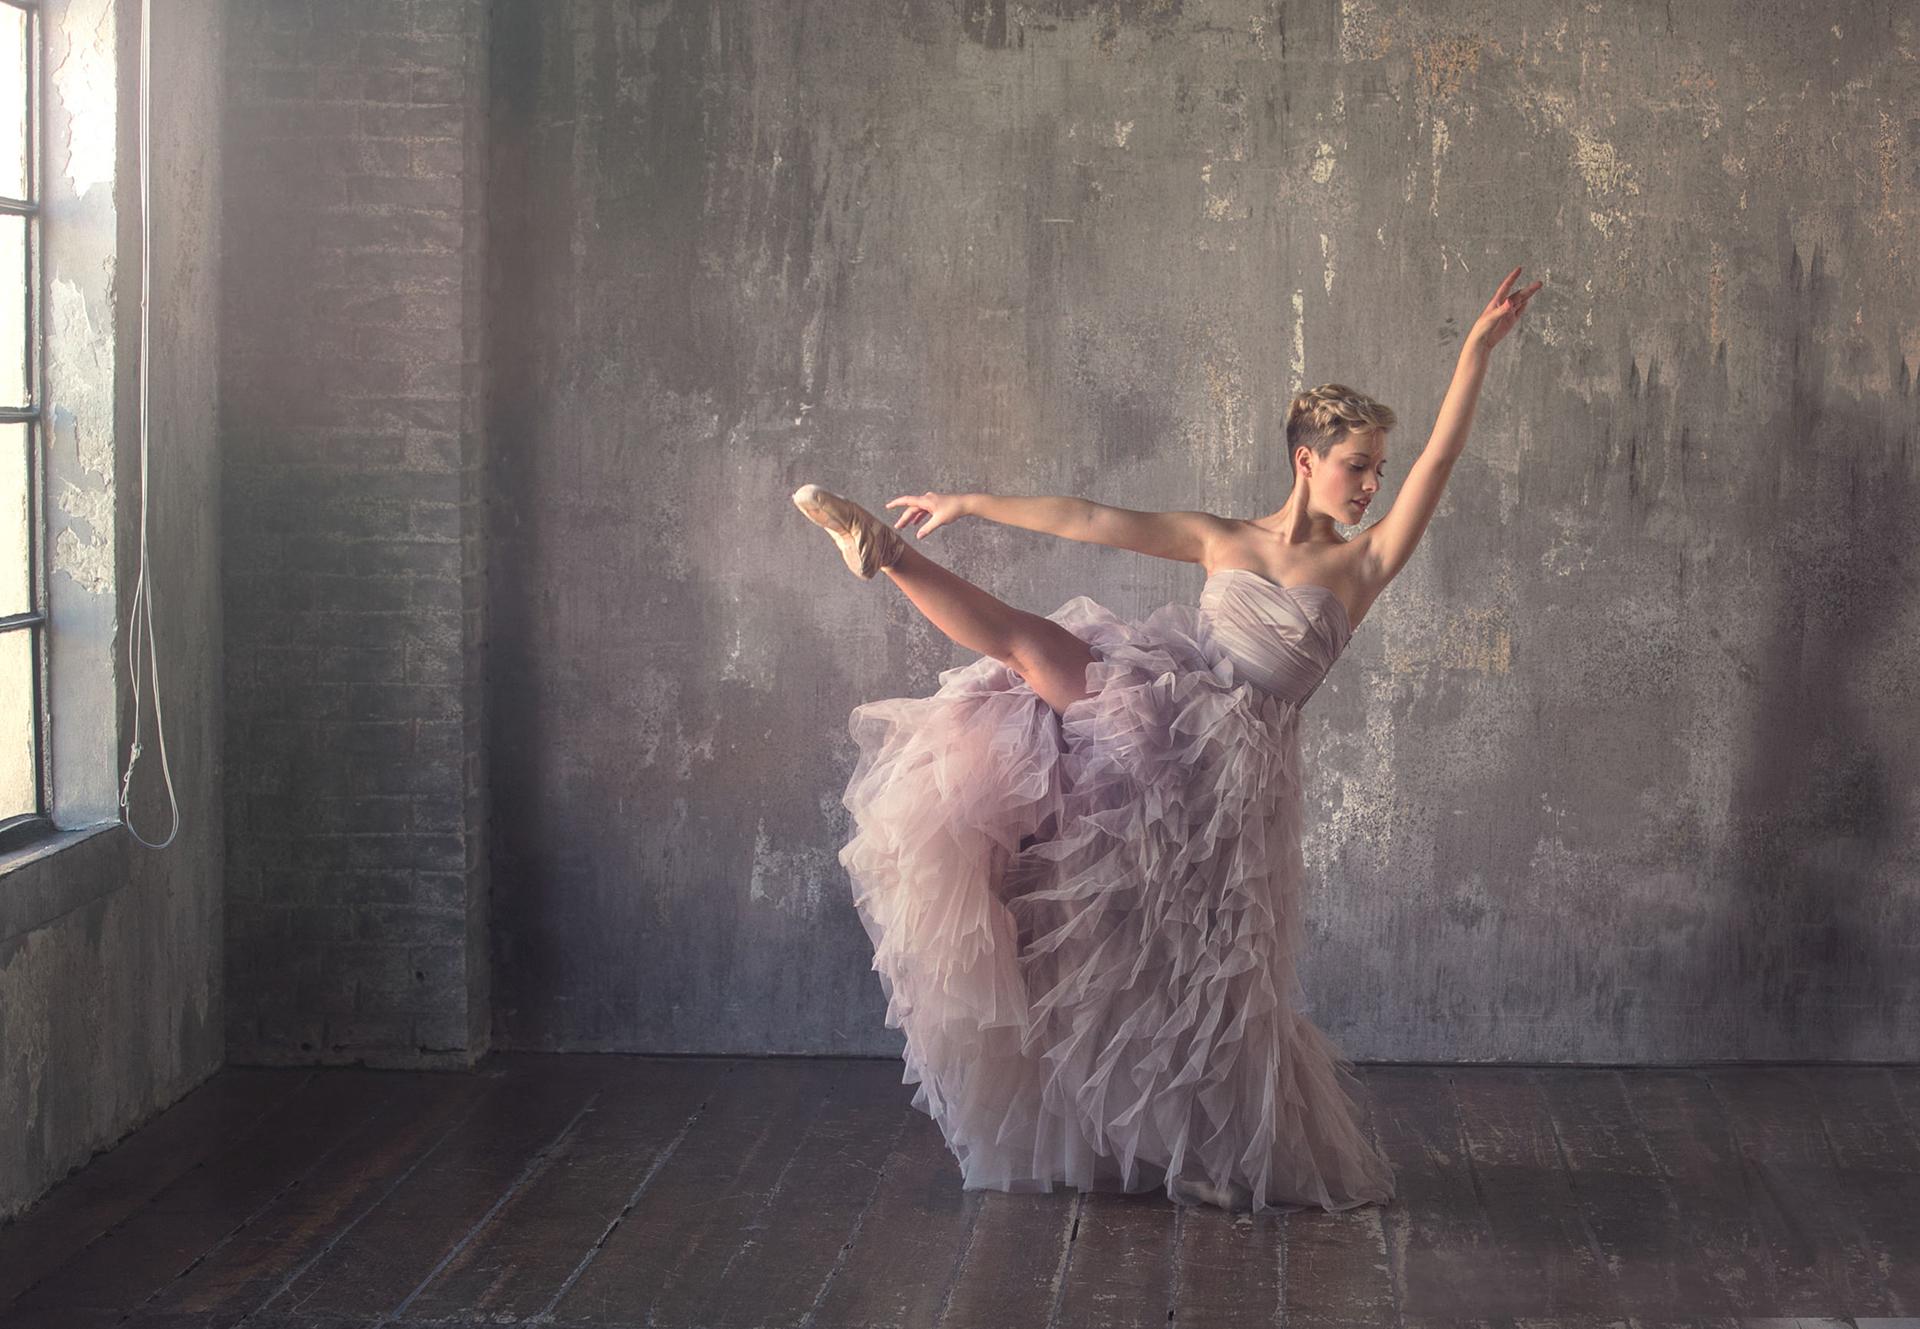 Ballerina-Pink-Dress-Photography-Starupphoto-Starnberg